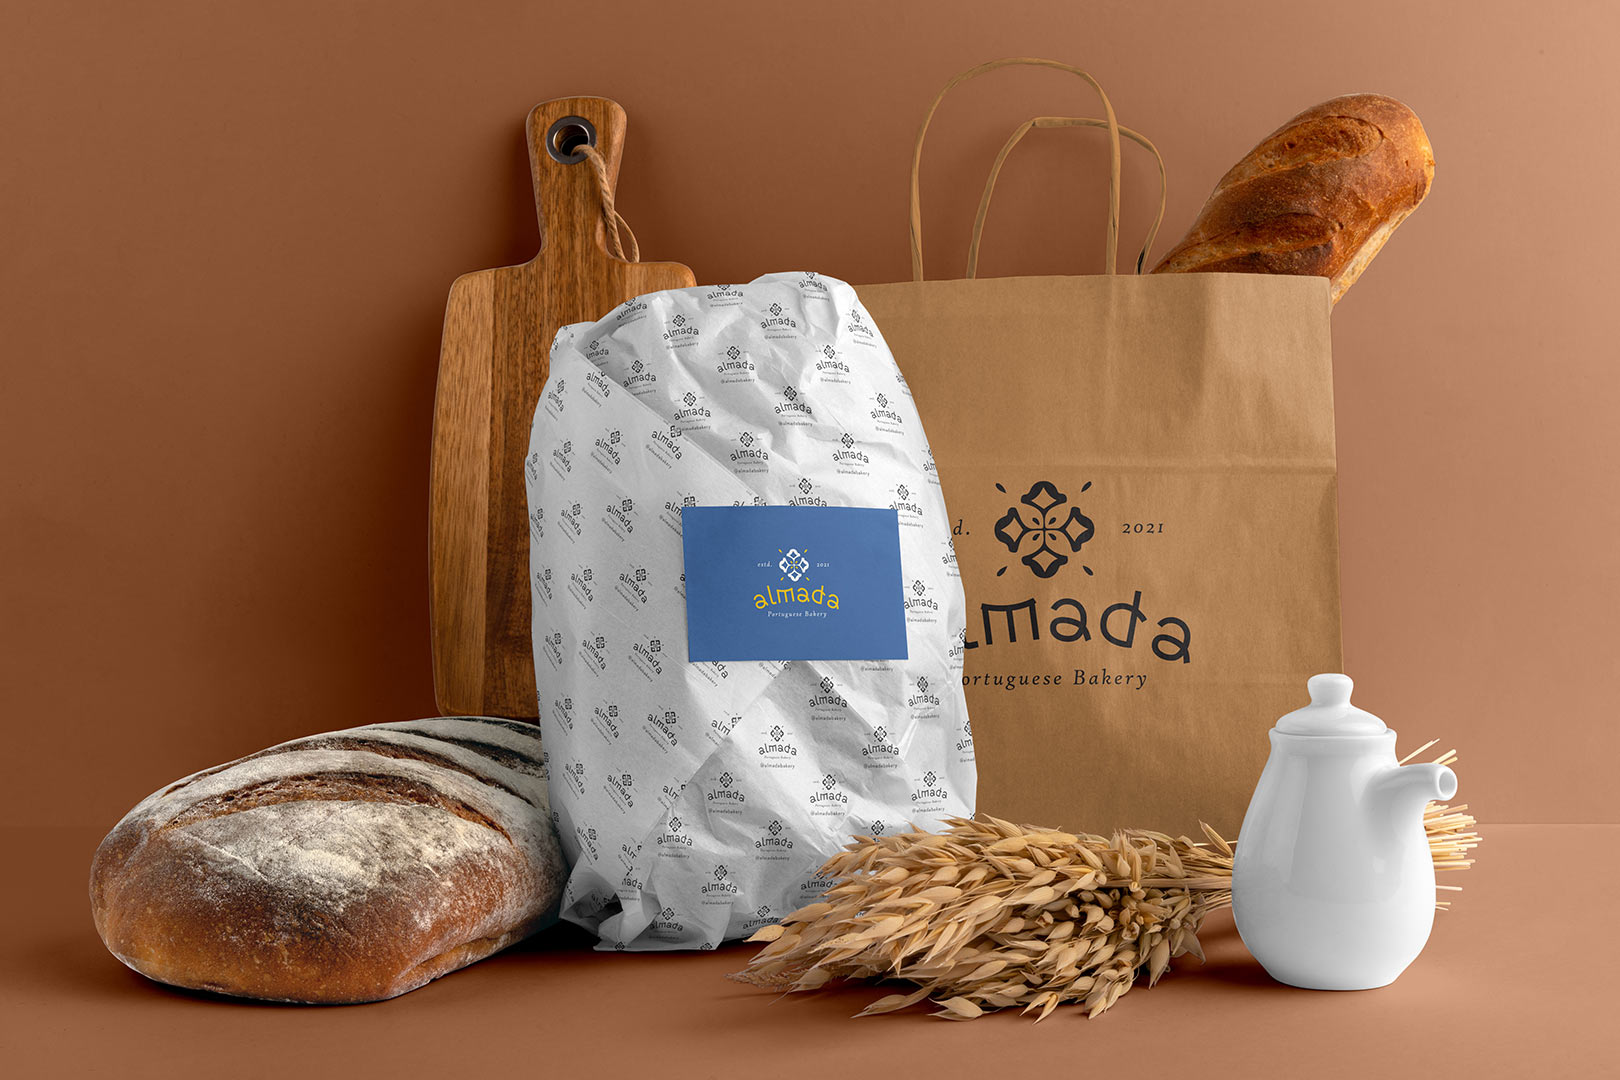 001-almada-bakery-branding-03